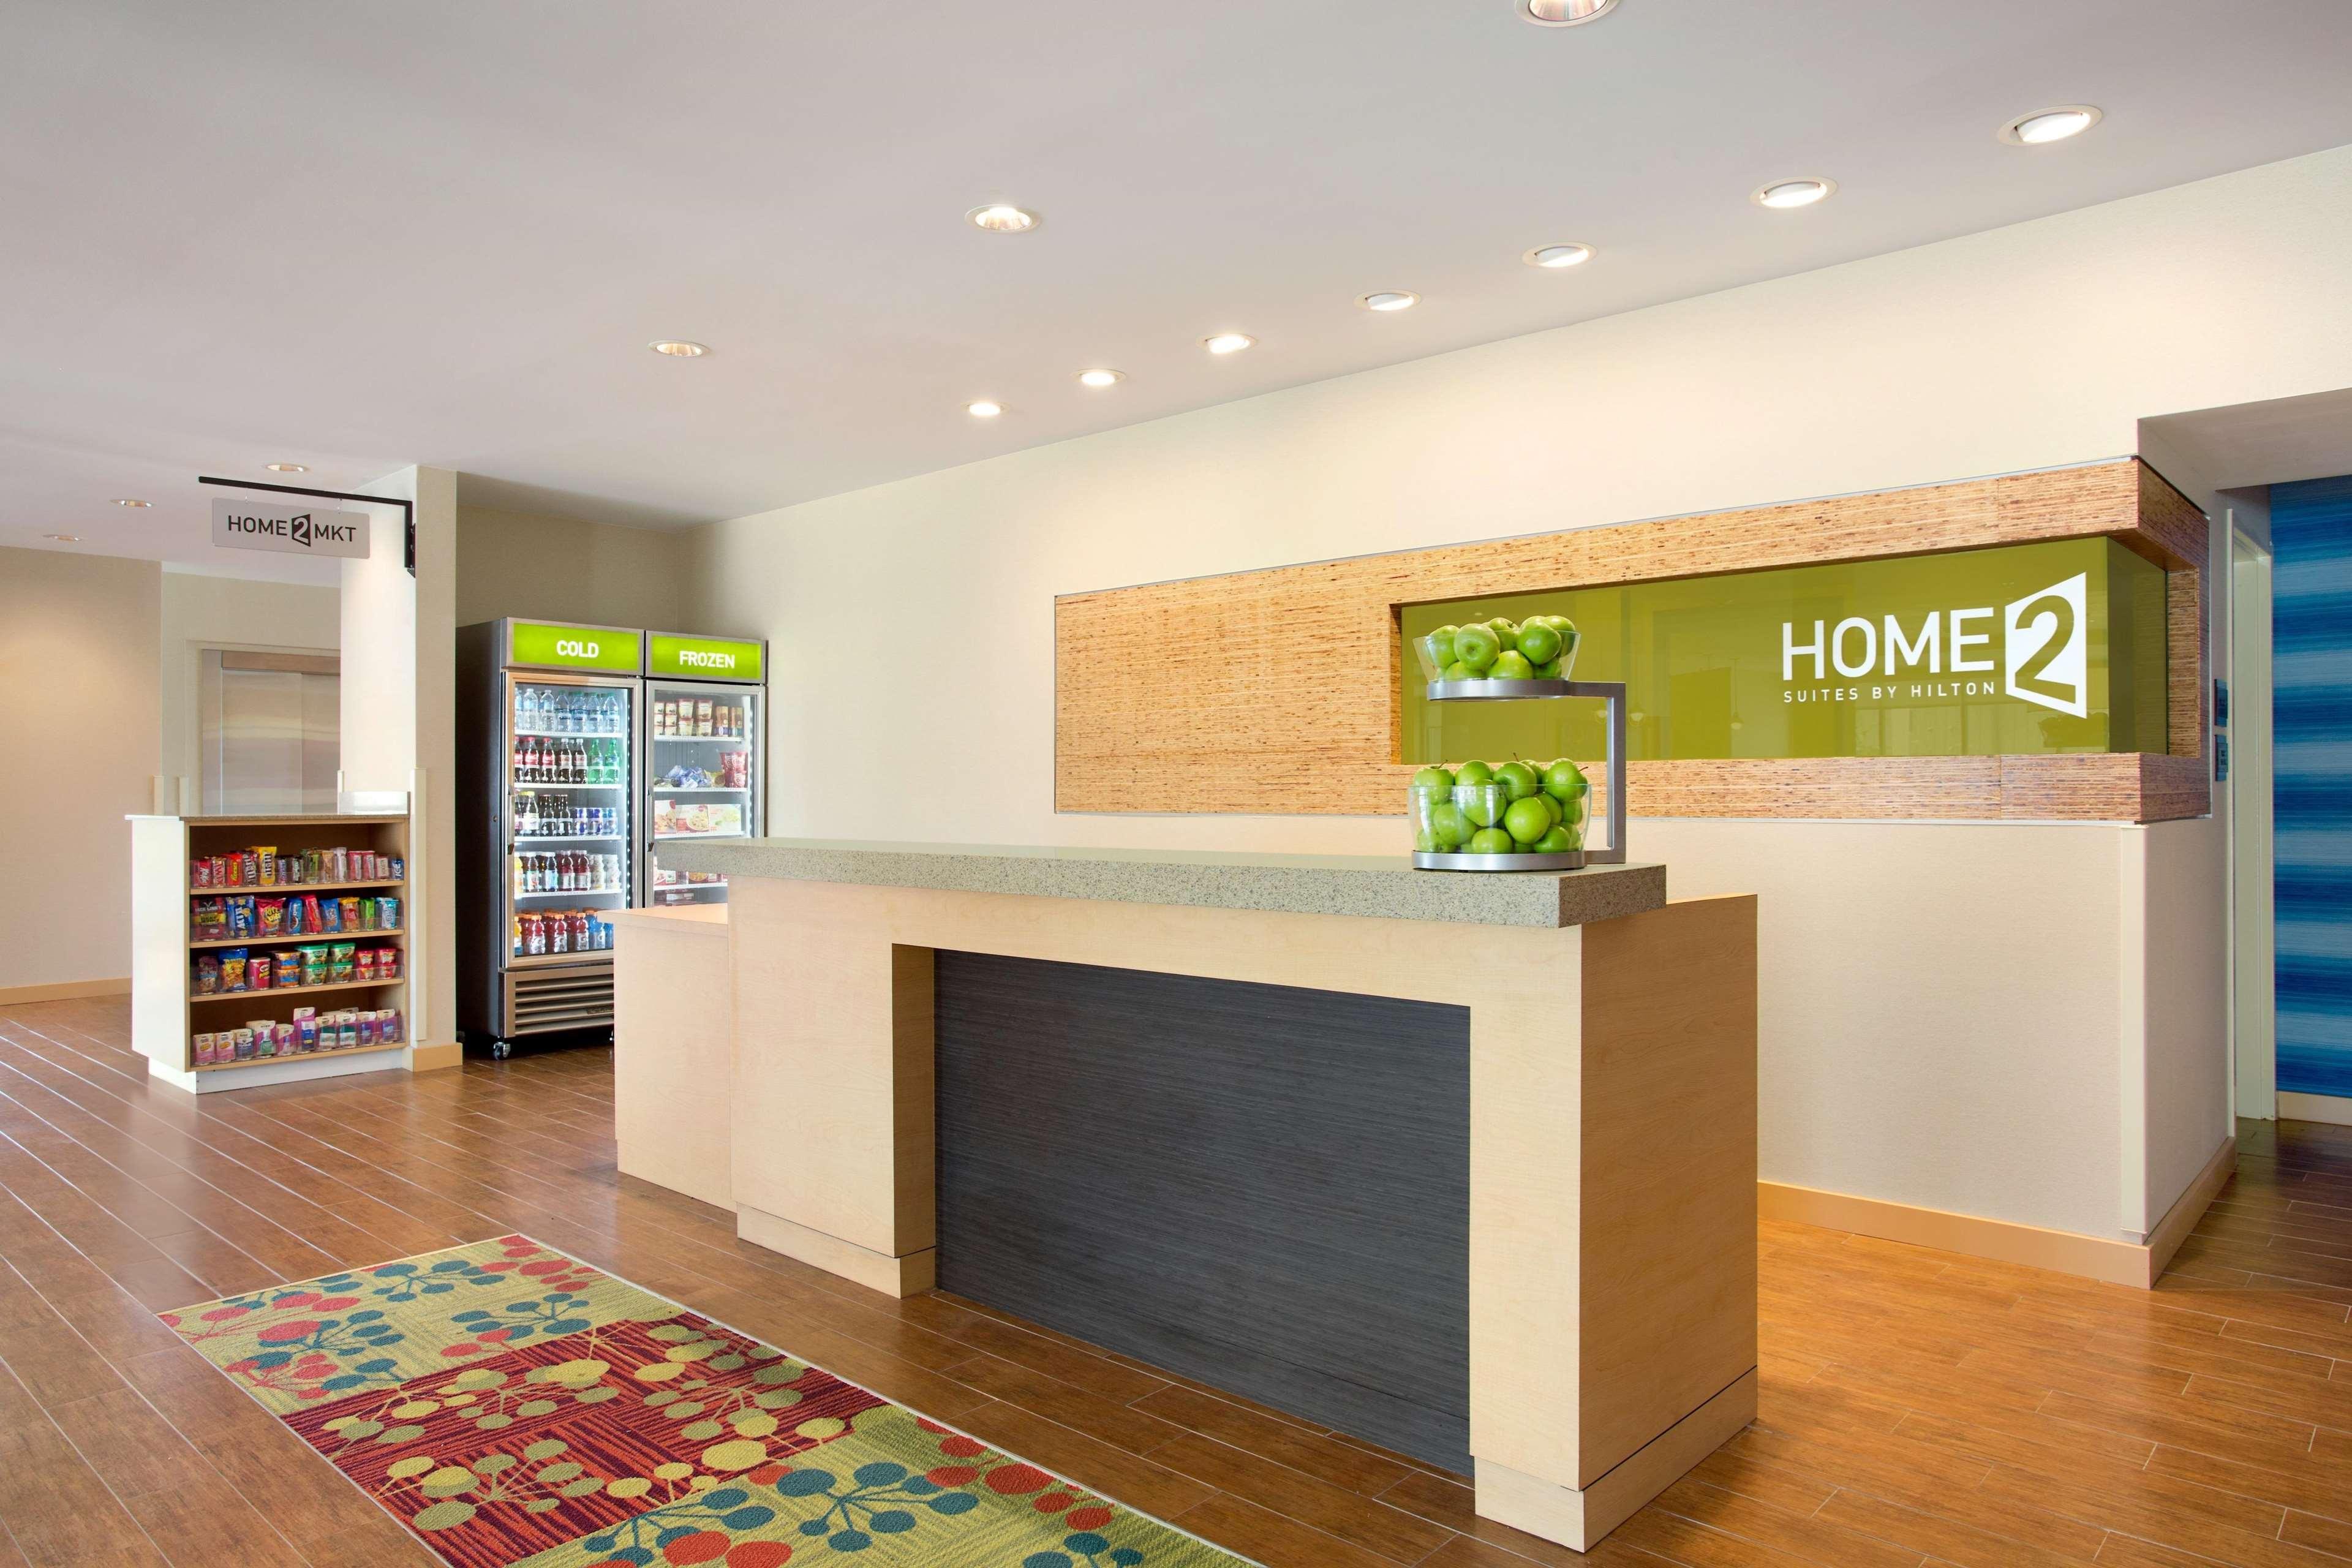 Home2 Suites by Hilton San Antonio Airport, TX image 6